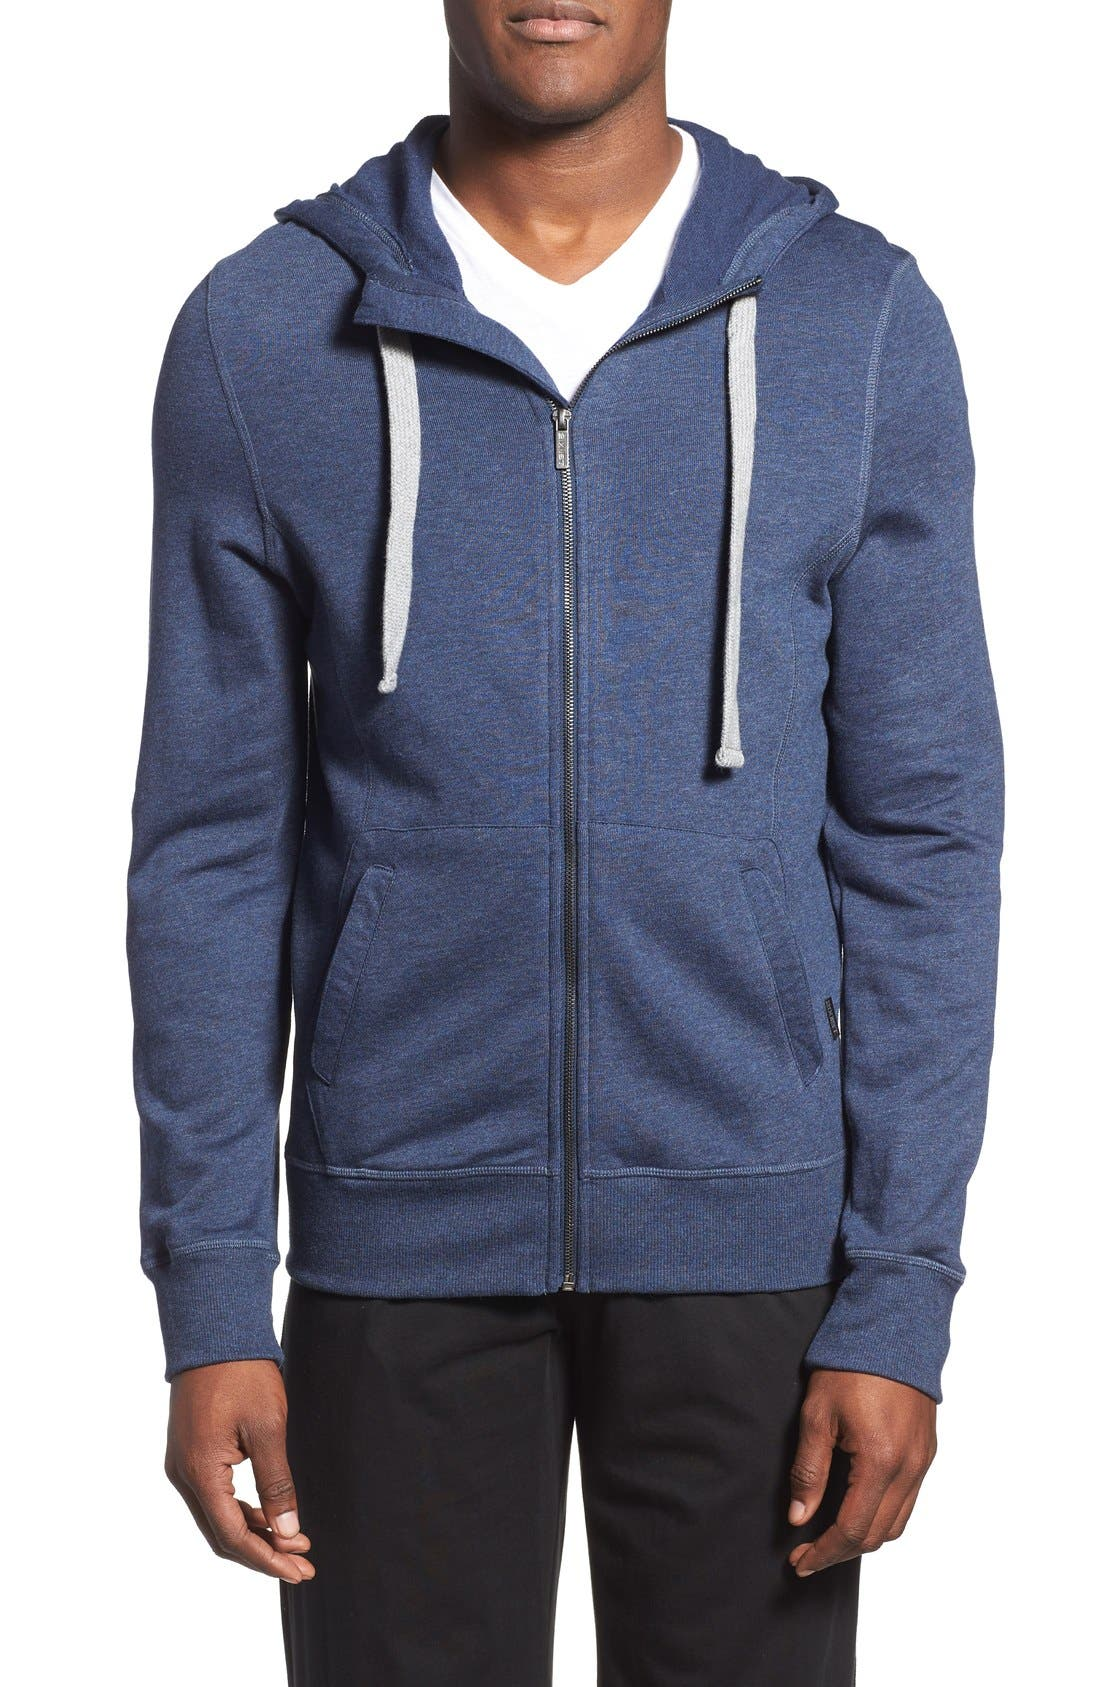 2(x)ist 'Terry' Cotton Blend Zip Hoodie